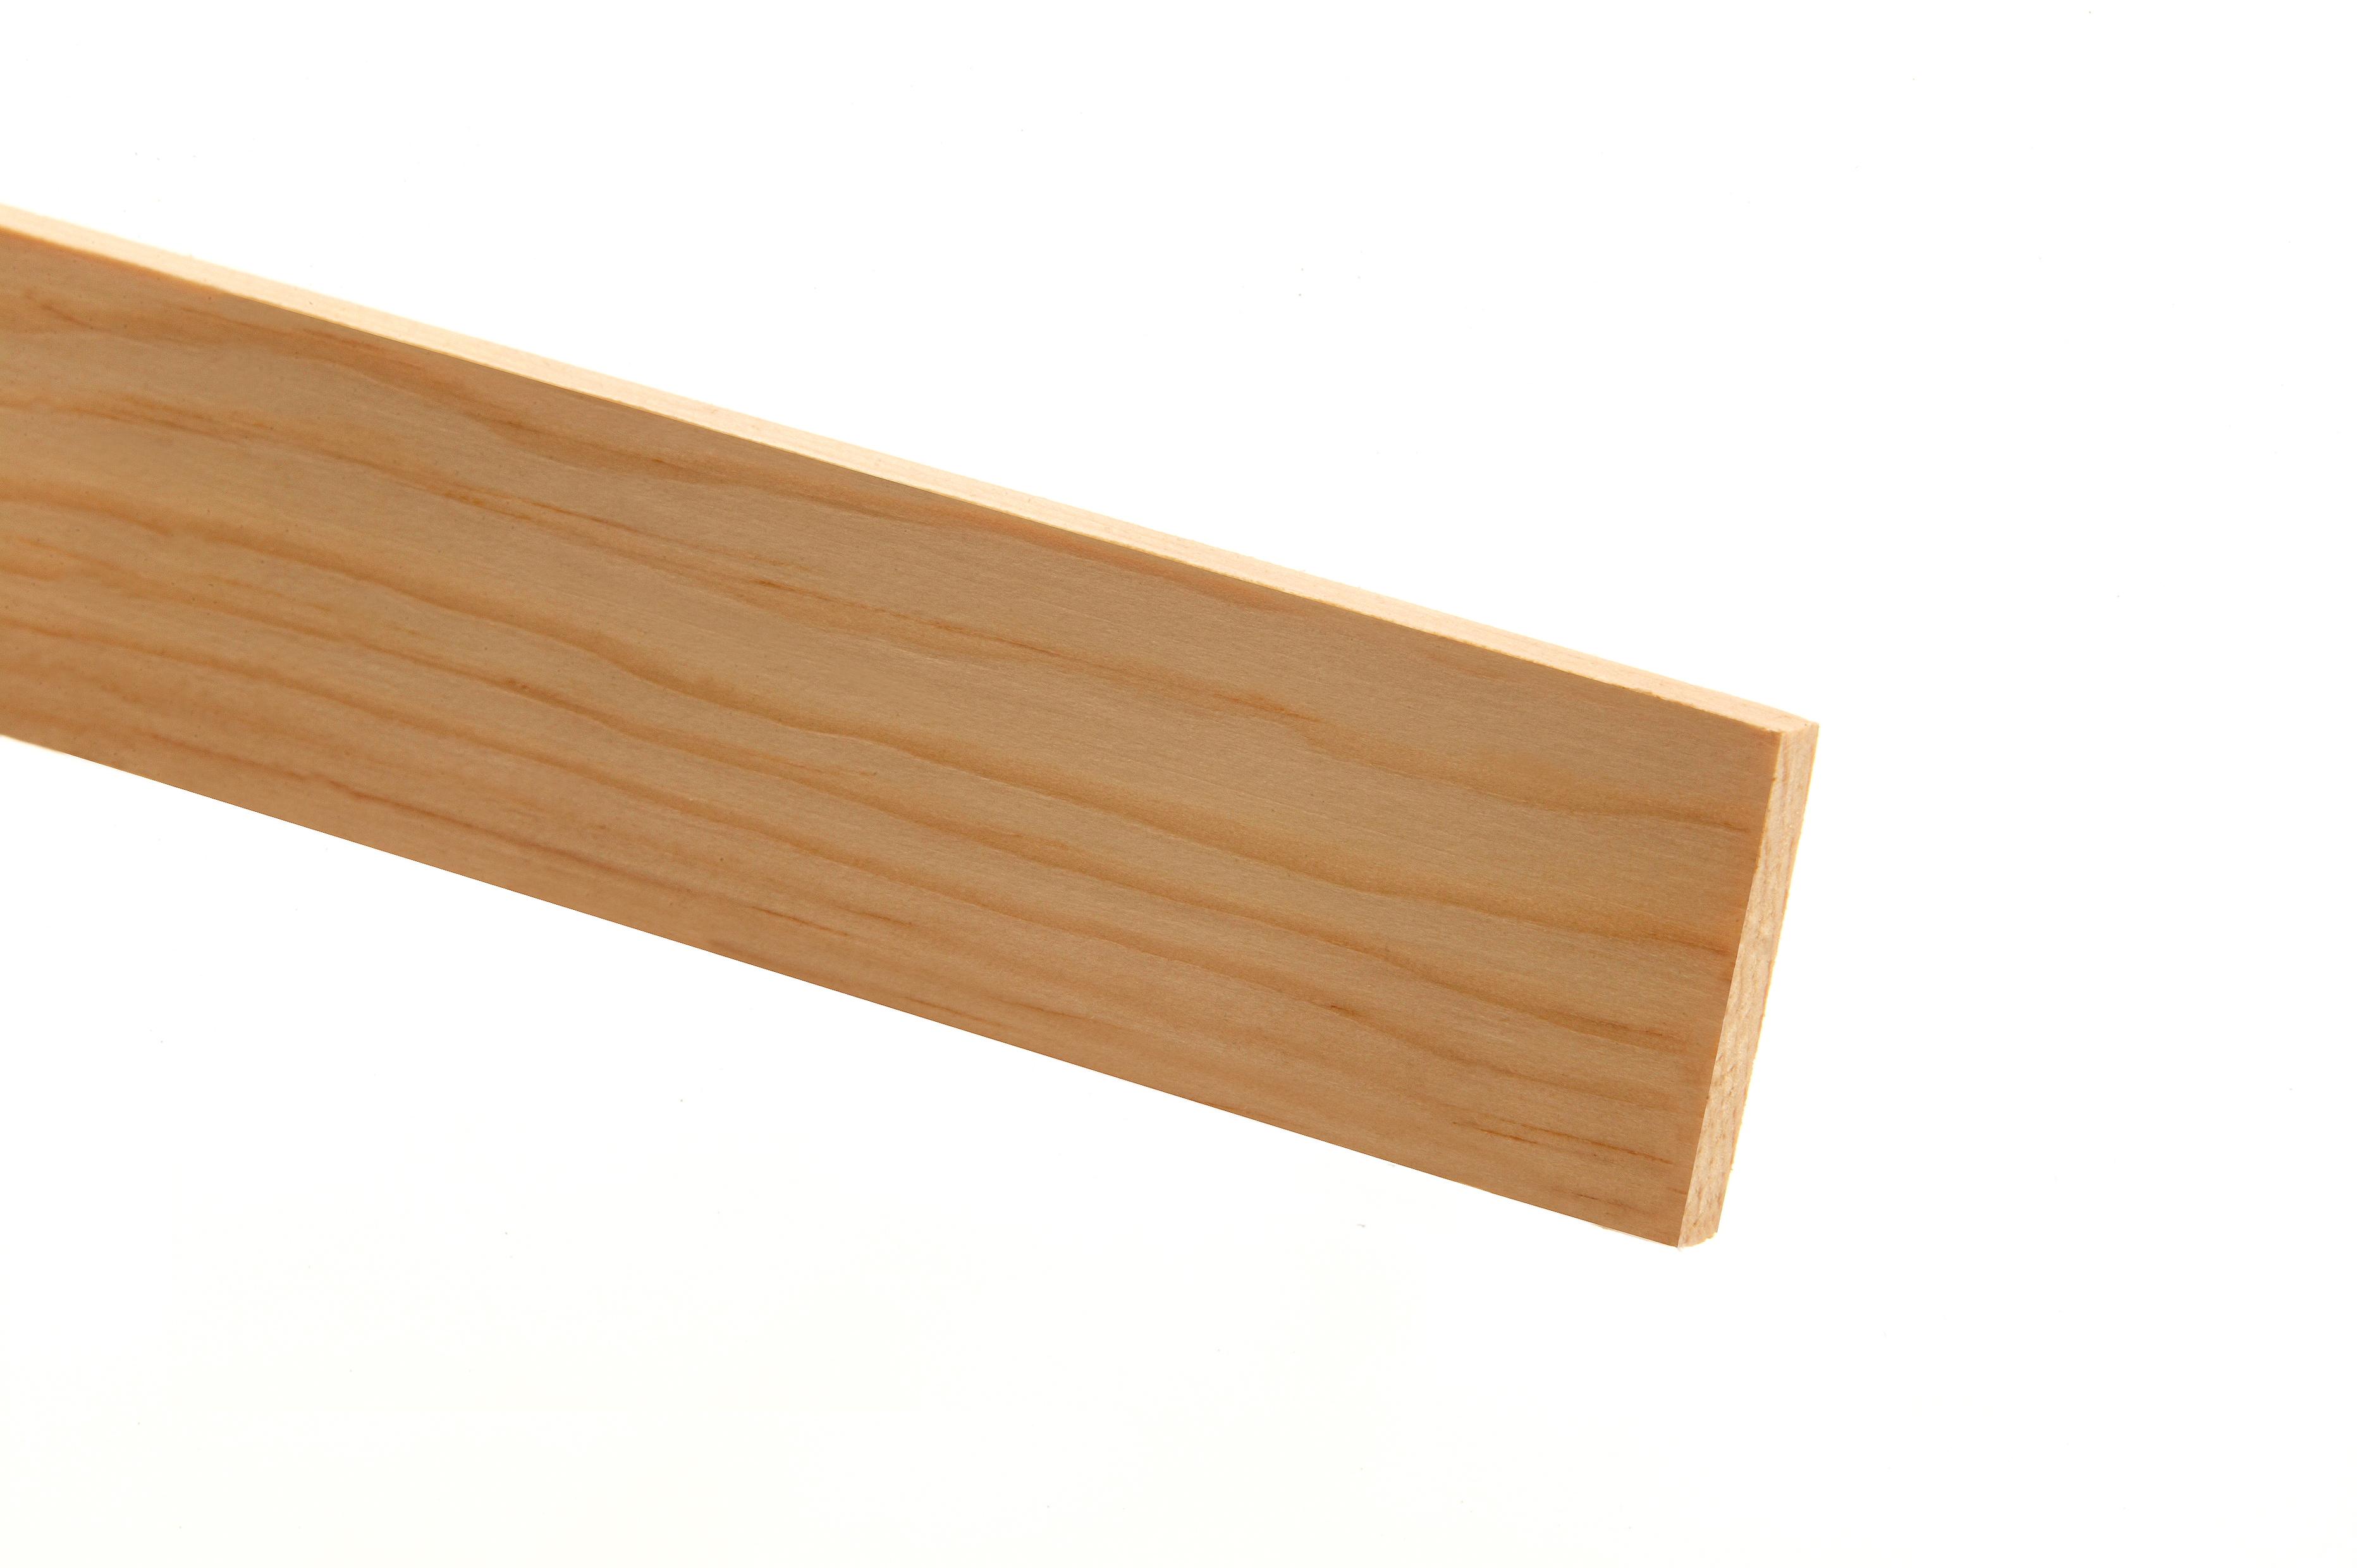 10 Pine PSE Stripwood 12 x 71 x 2400mm